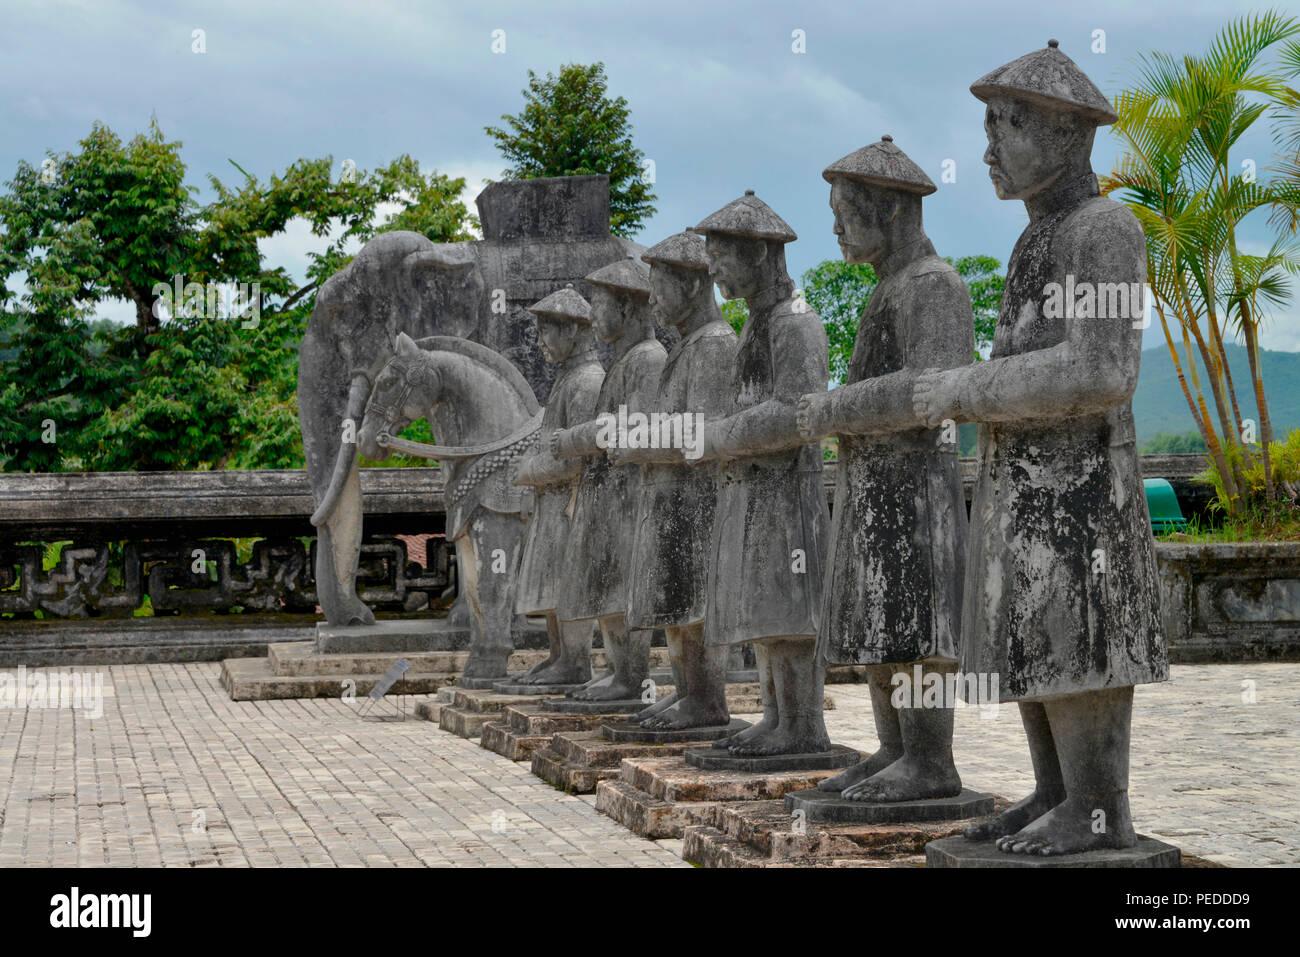 Betonfiguren, Kaisergrab Khai Dinh, Hue, Vietnam - Stock Image